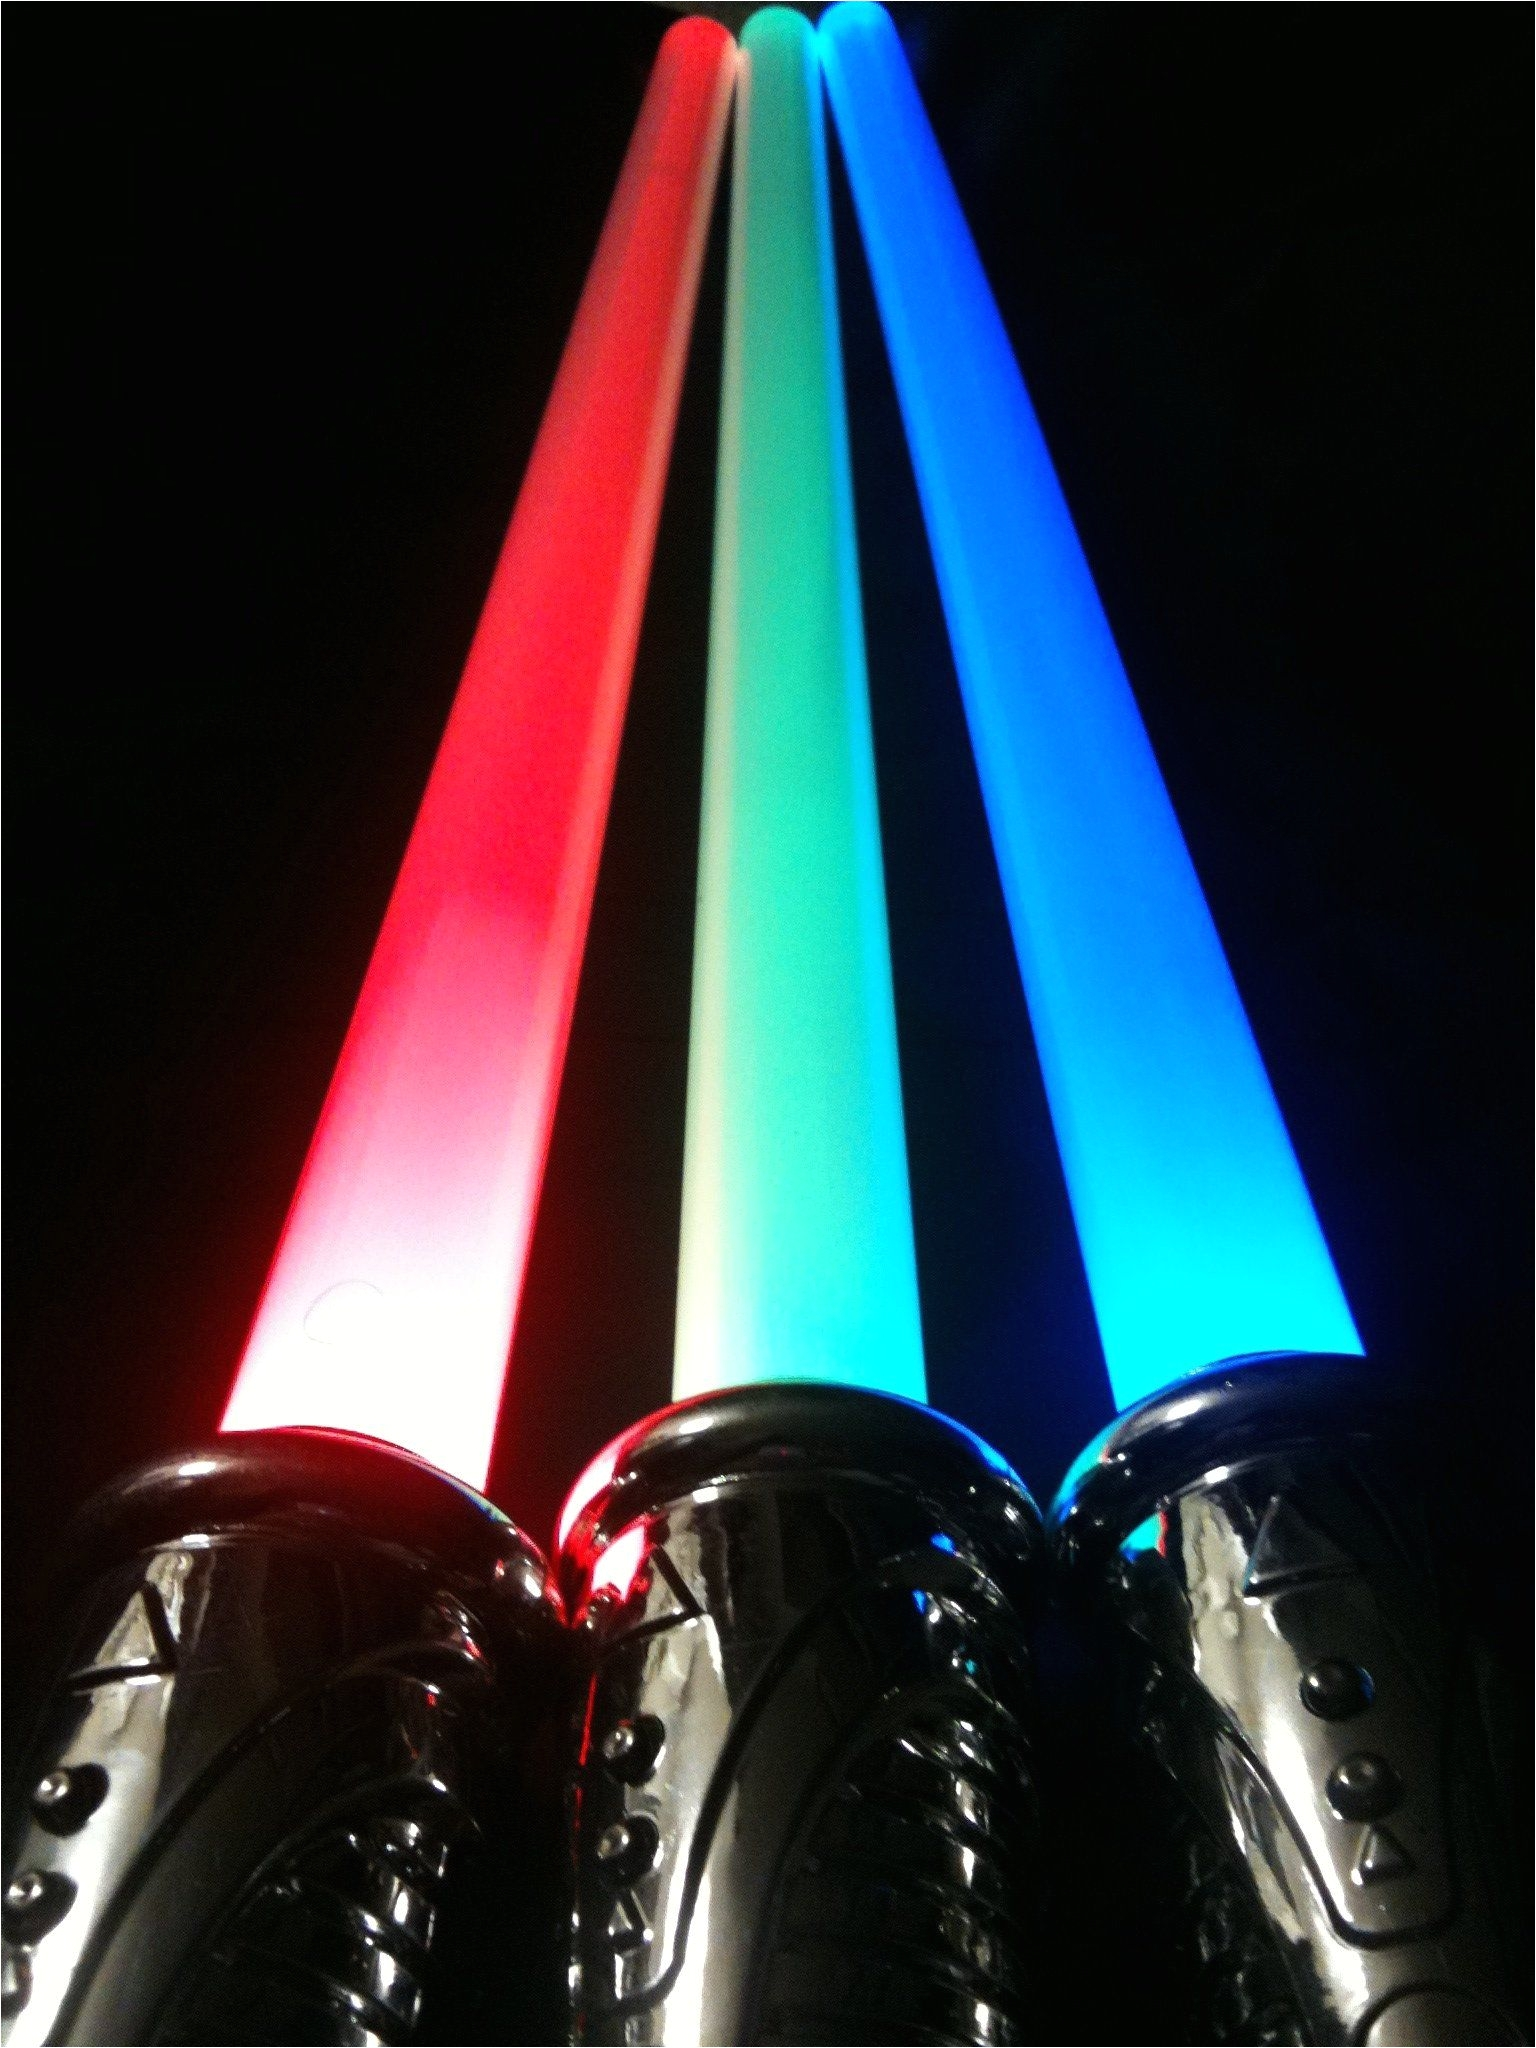 led lights geek gifts fbls got the best novelty space saber party favors affordable